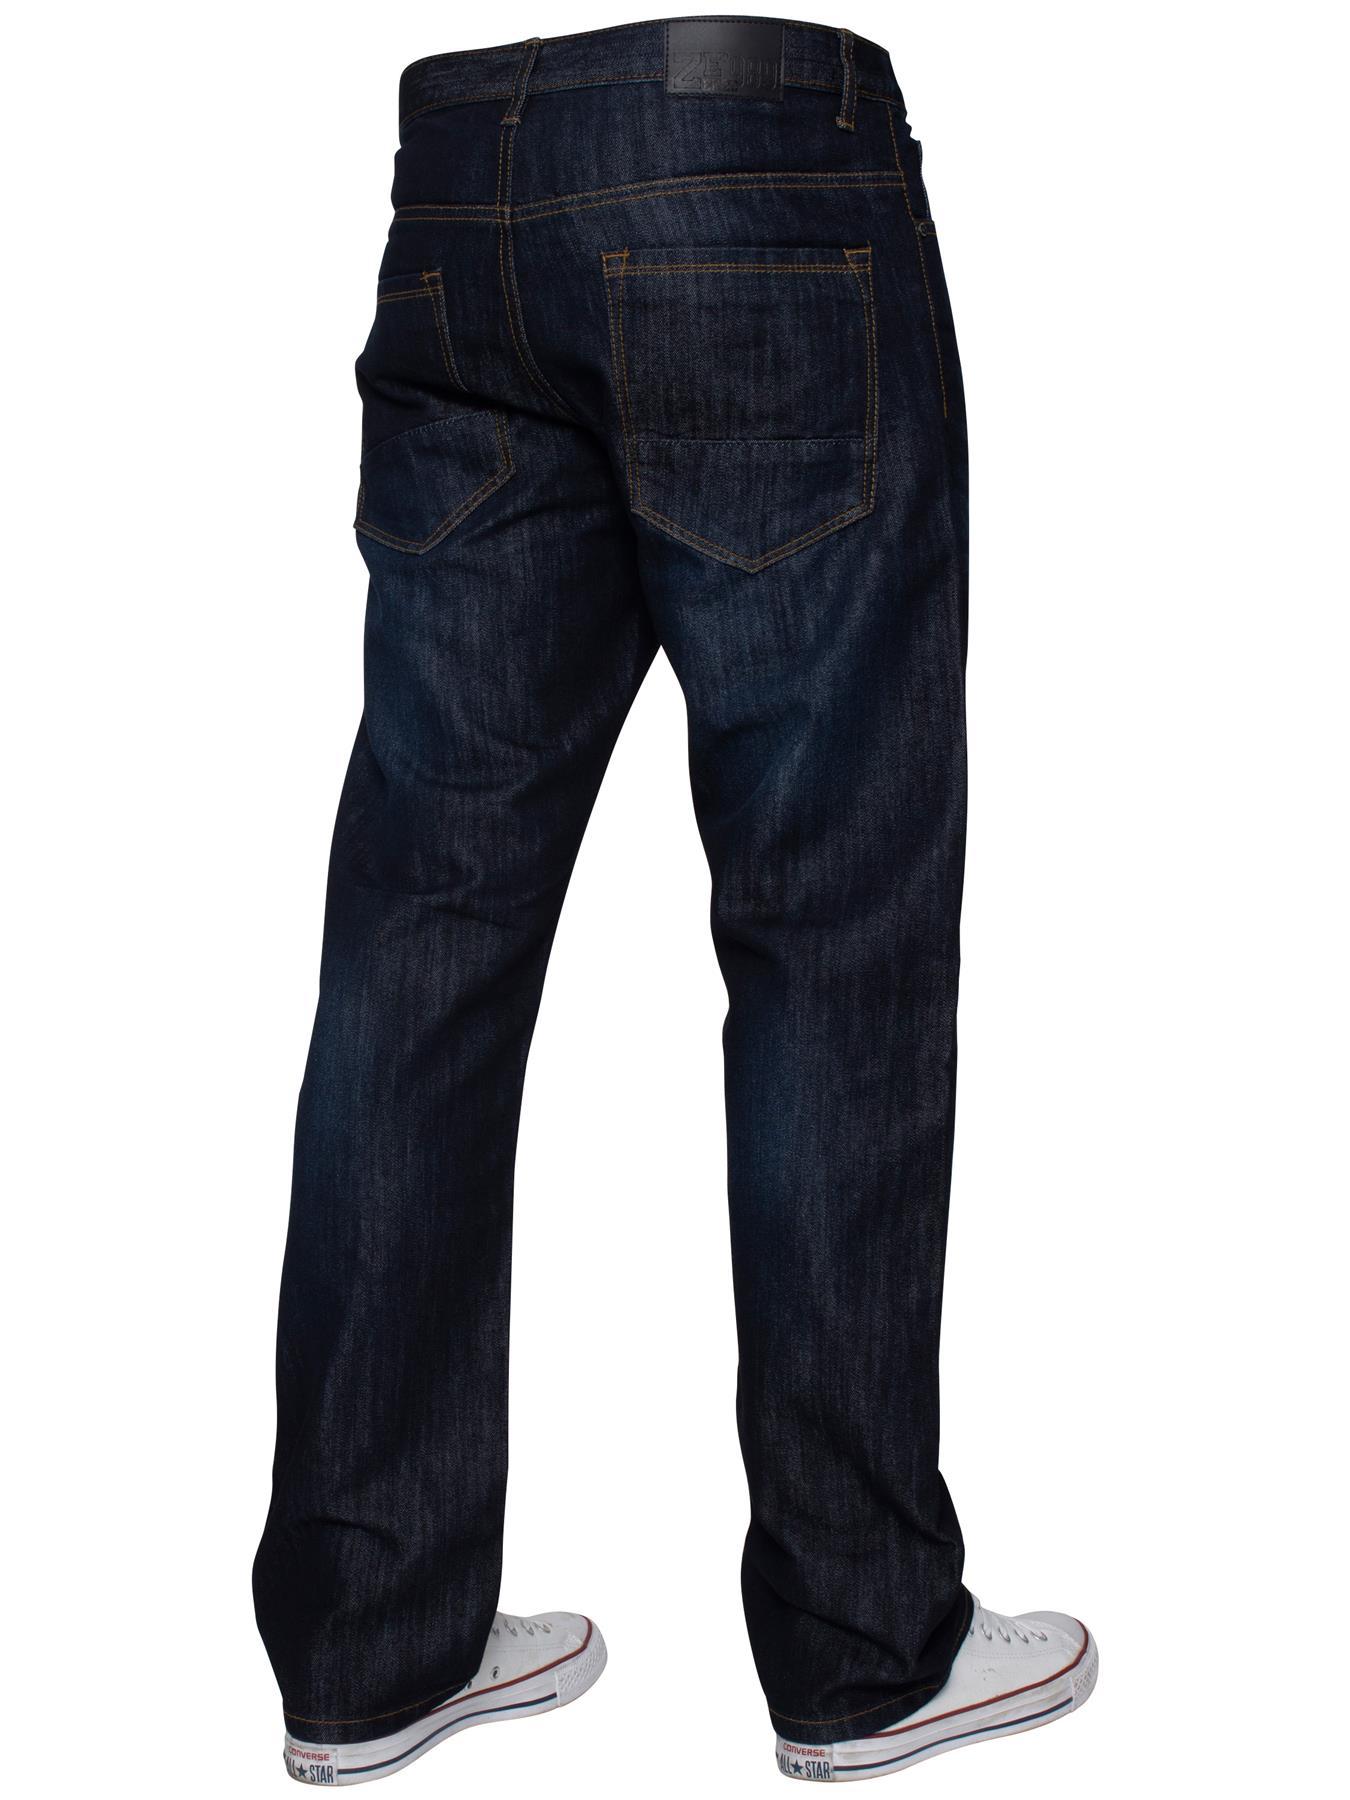 Mens-Regular-Fit-Jeans-Straight-Leg-Denim-Pants-Trousers-Pants-All-Waist-Sizes thumbnail 18